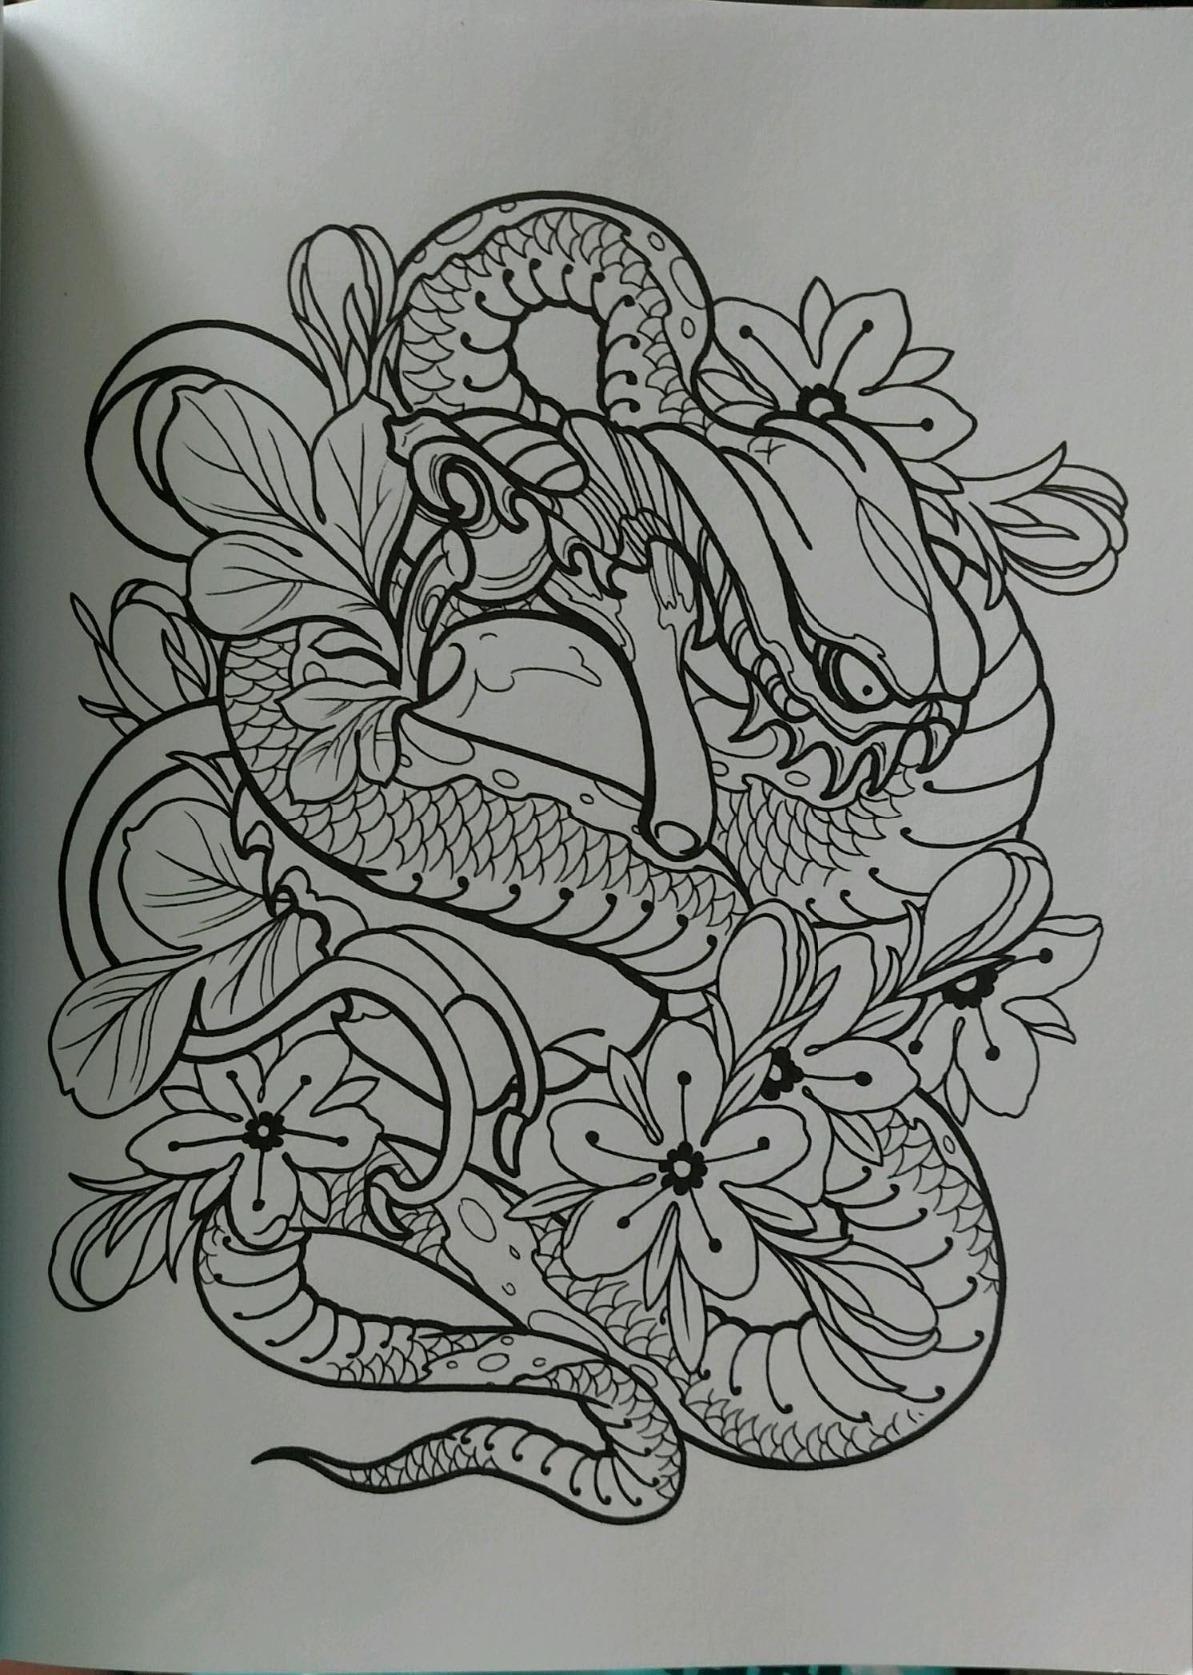 Creative Haven Modern Tattoo Designs Coloring Book (creative